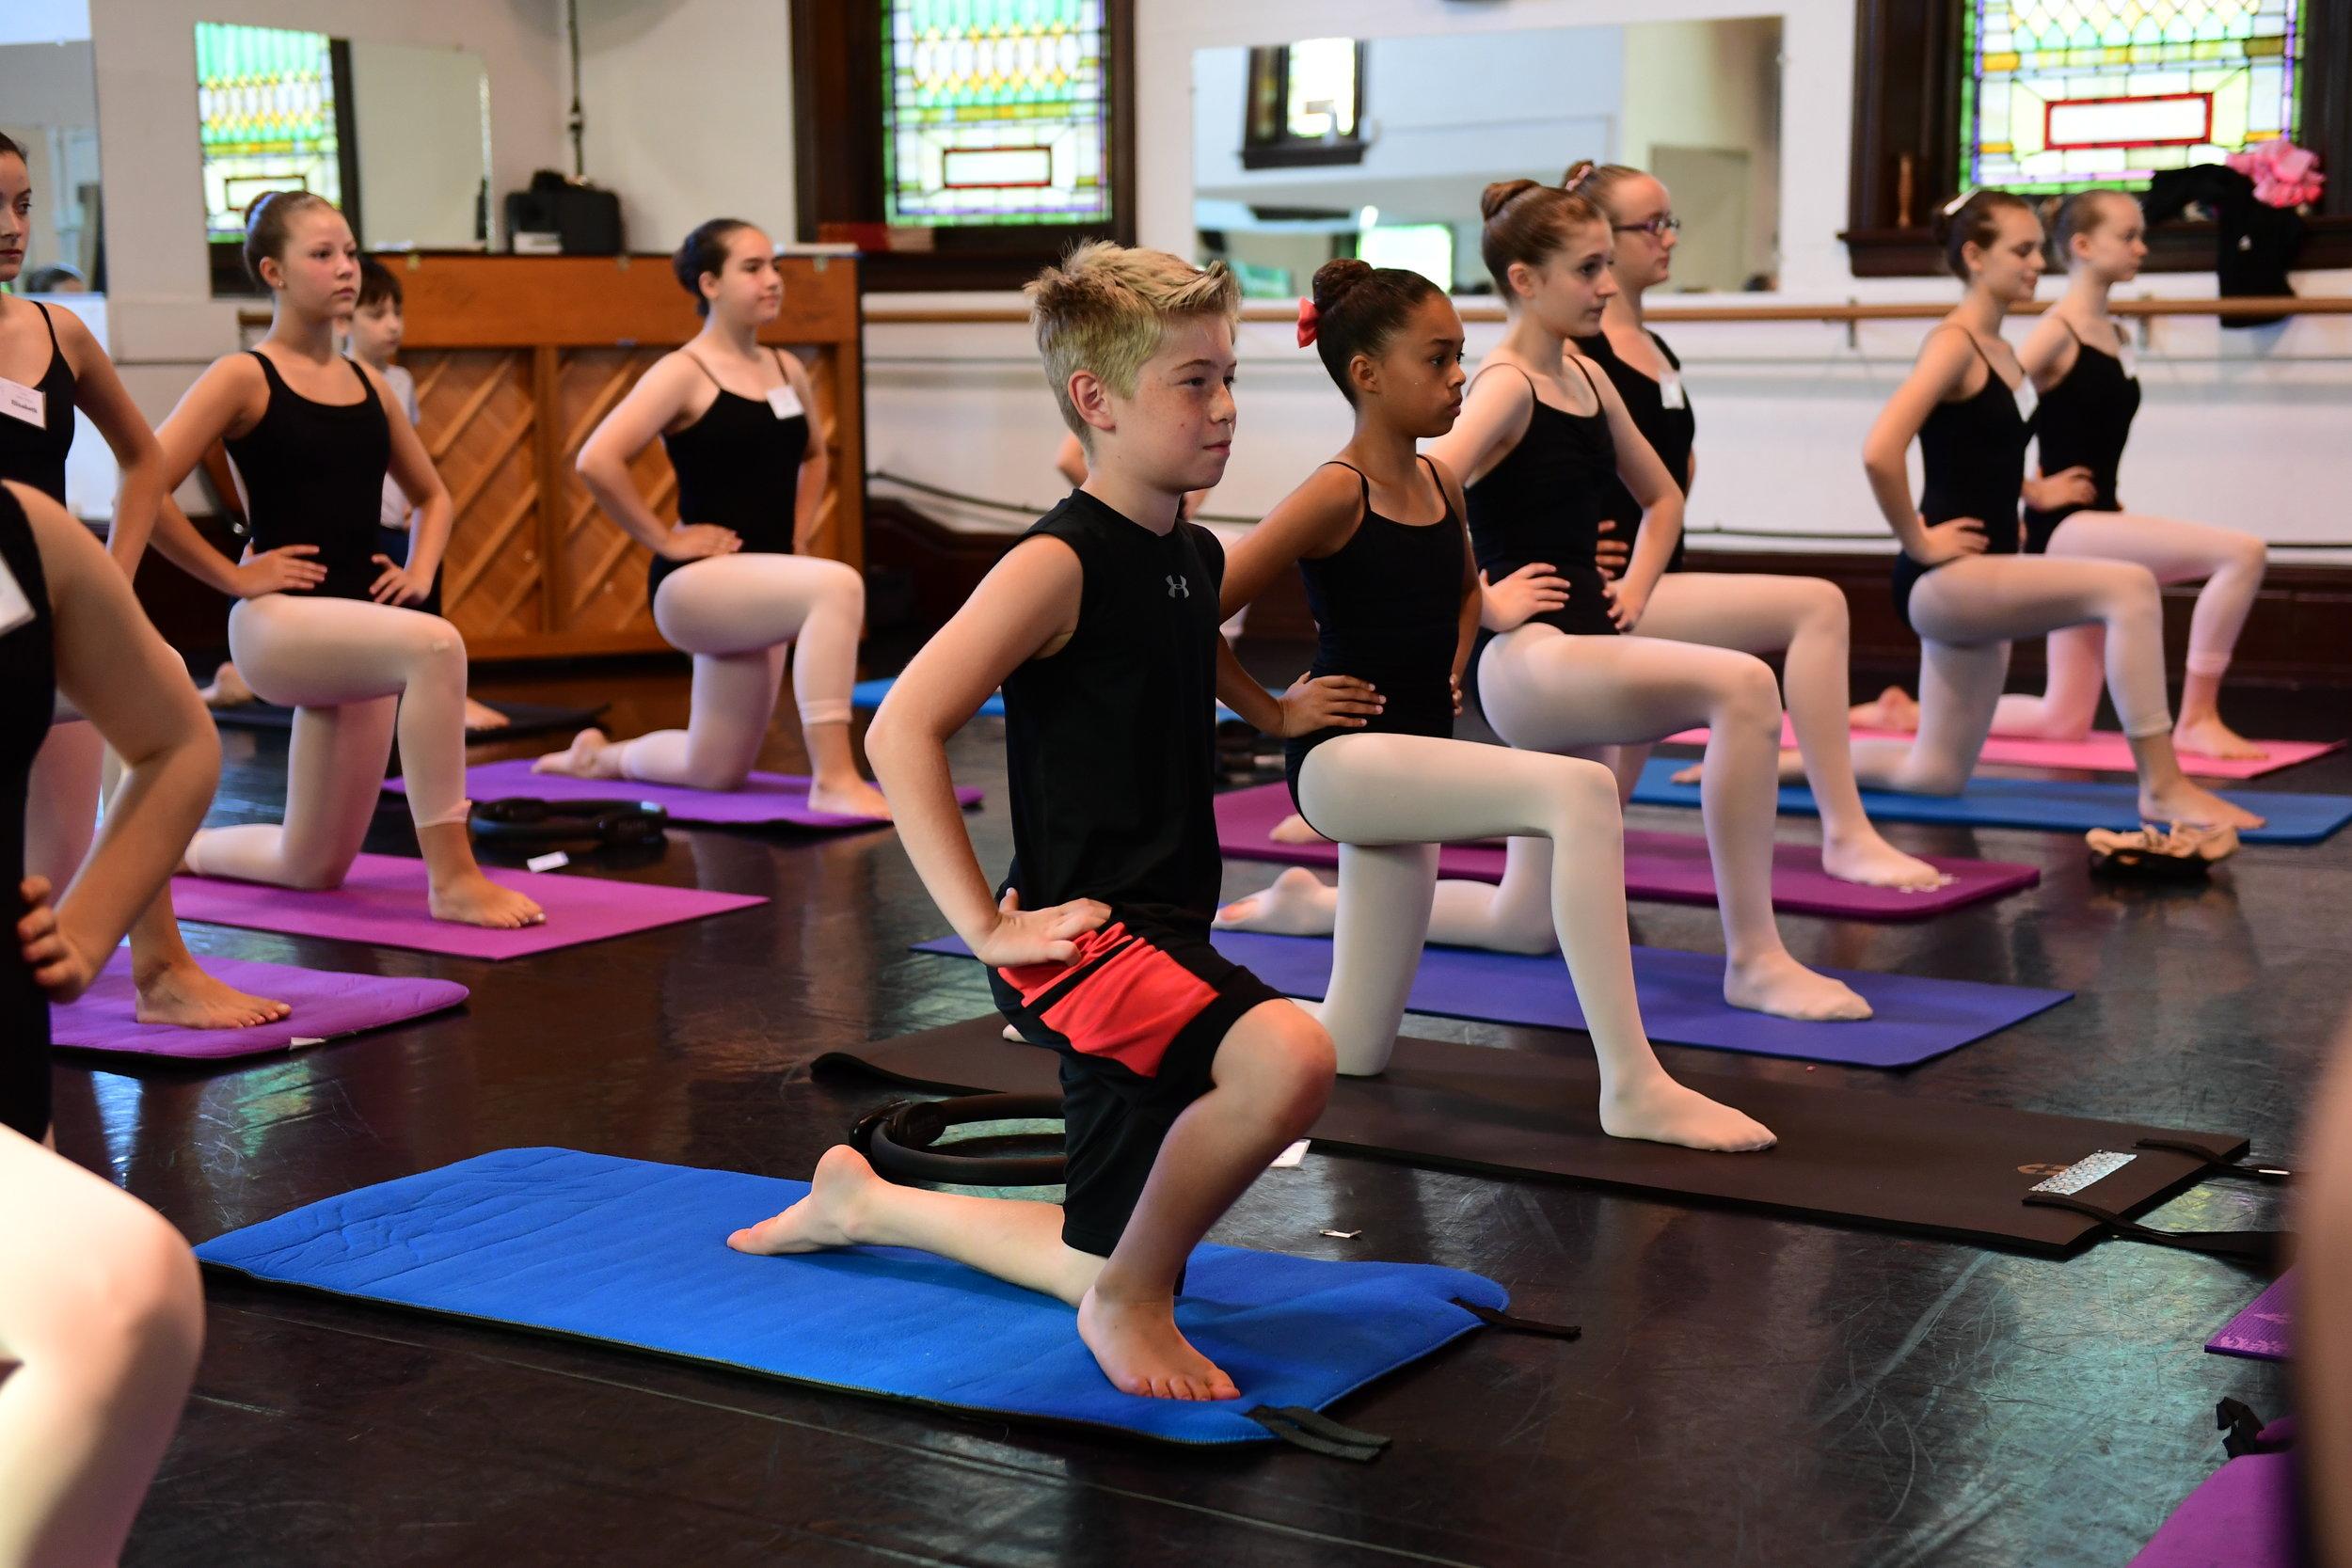 Ballet Summer Intensive students taking pilates